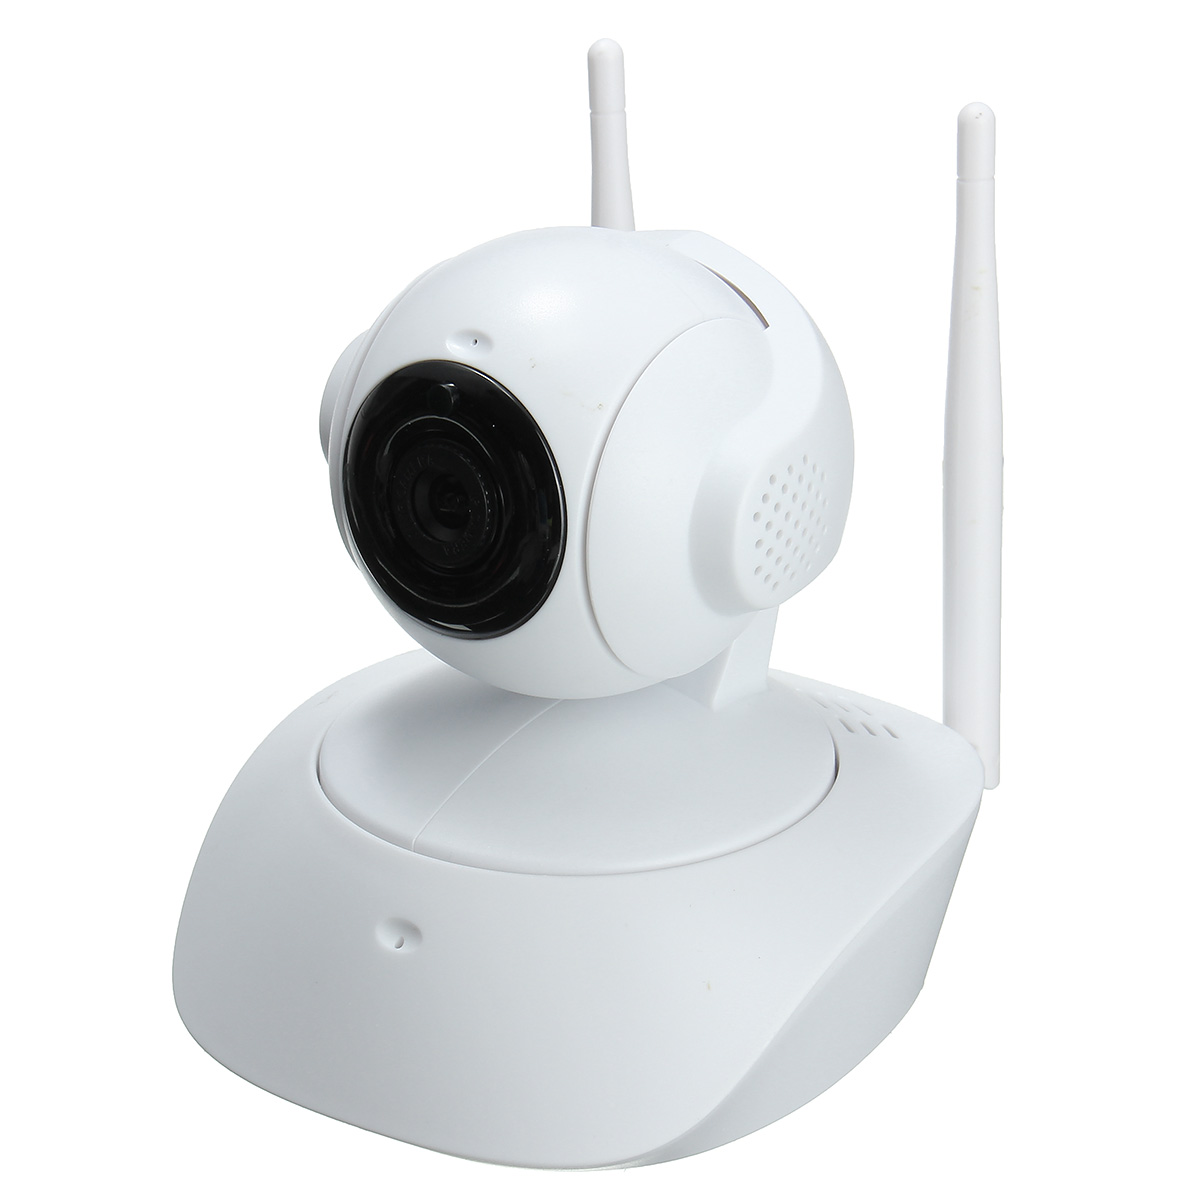 Wireless WiFi 720P HD Network CCTV HOME Security IP Camera ...